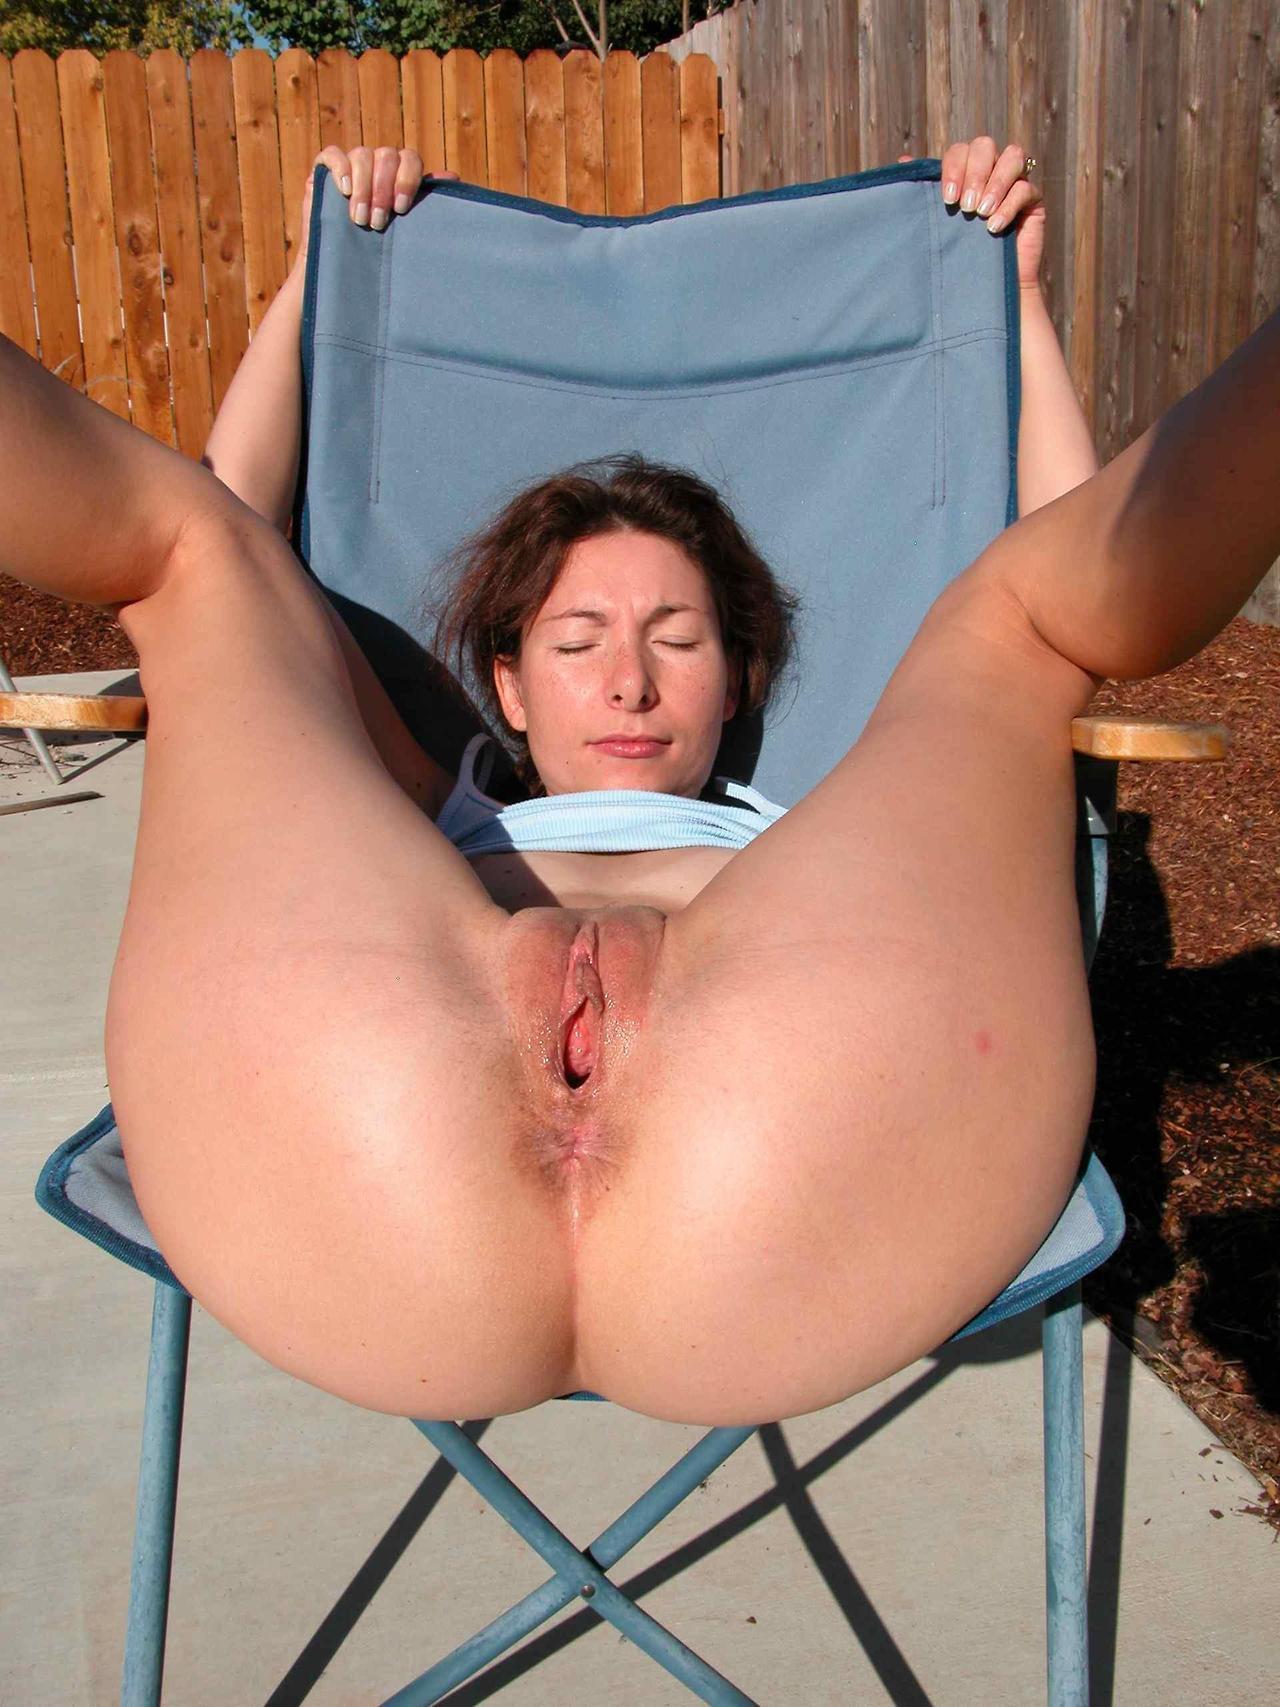 Ebony sex xxx nice booty vid  huge boobs massive live booty shaking